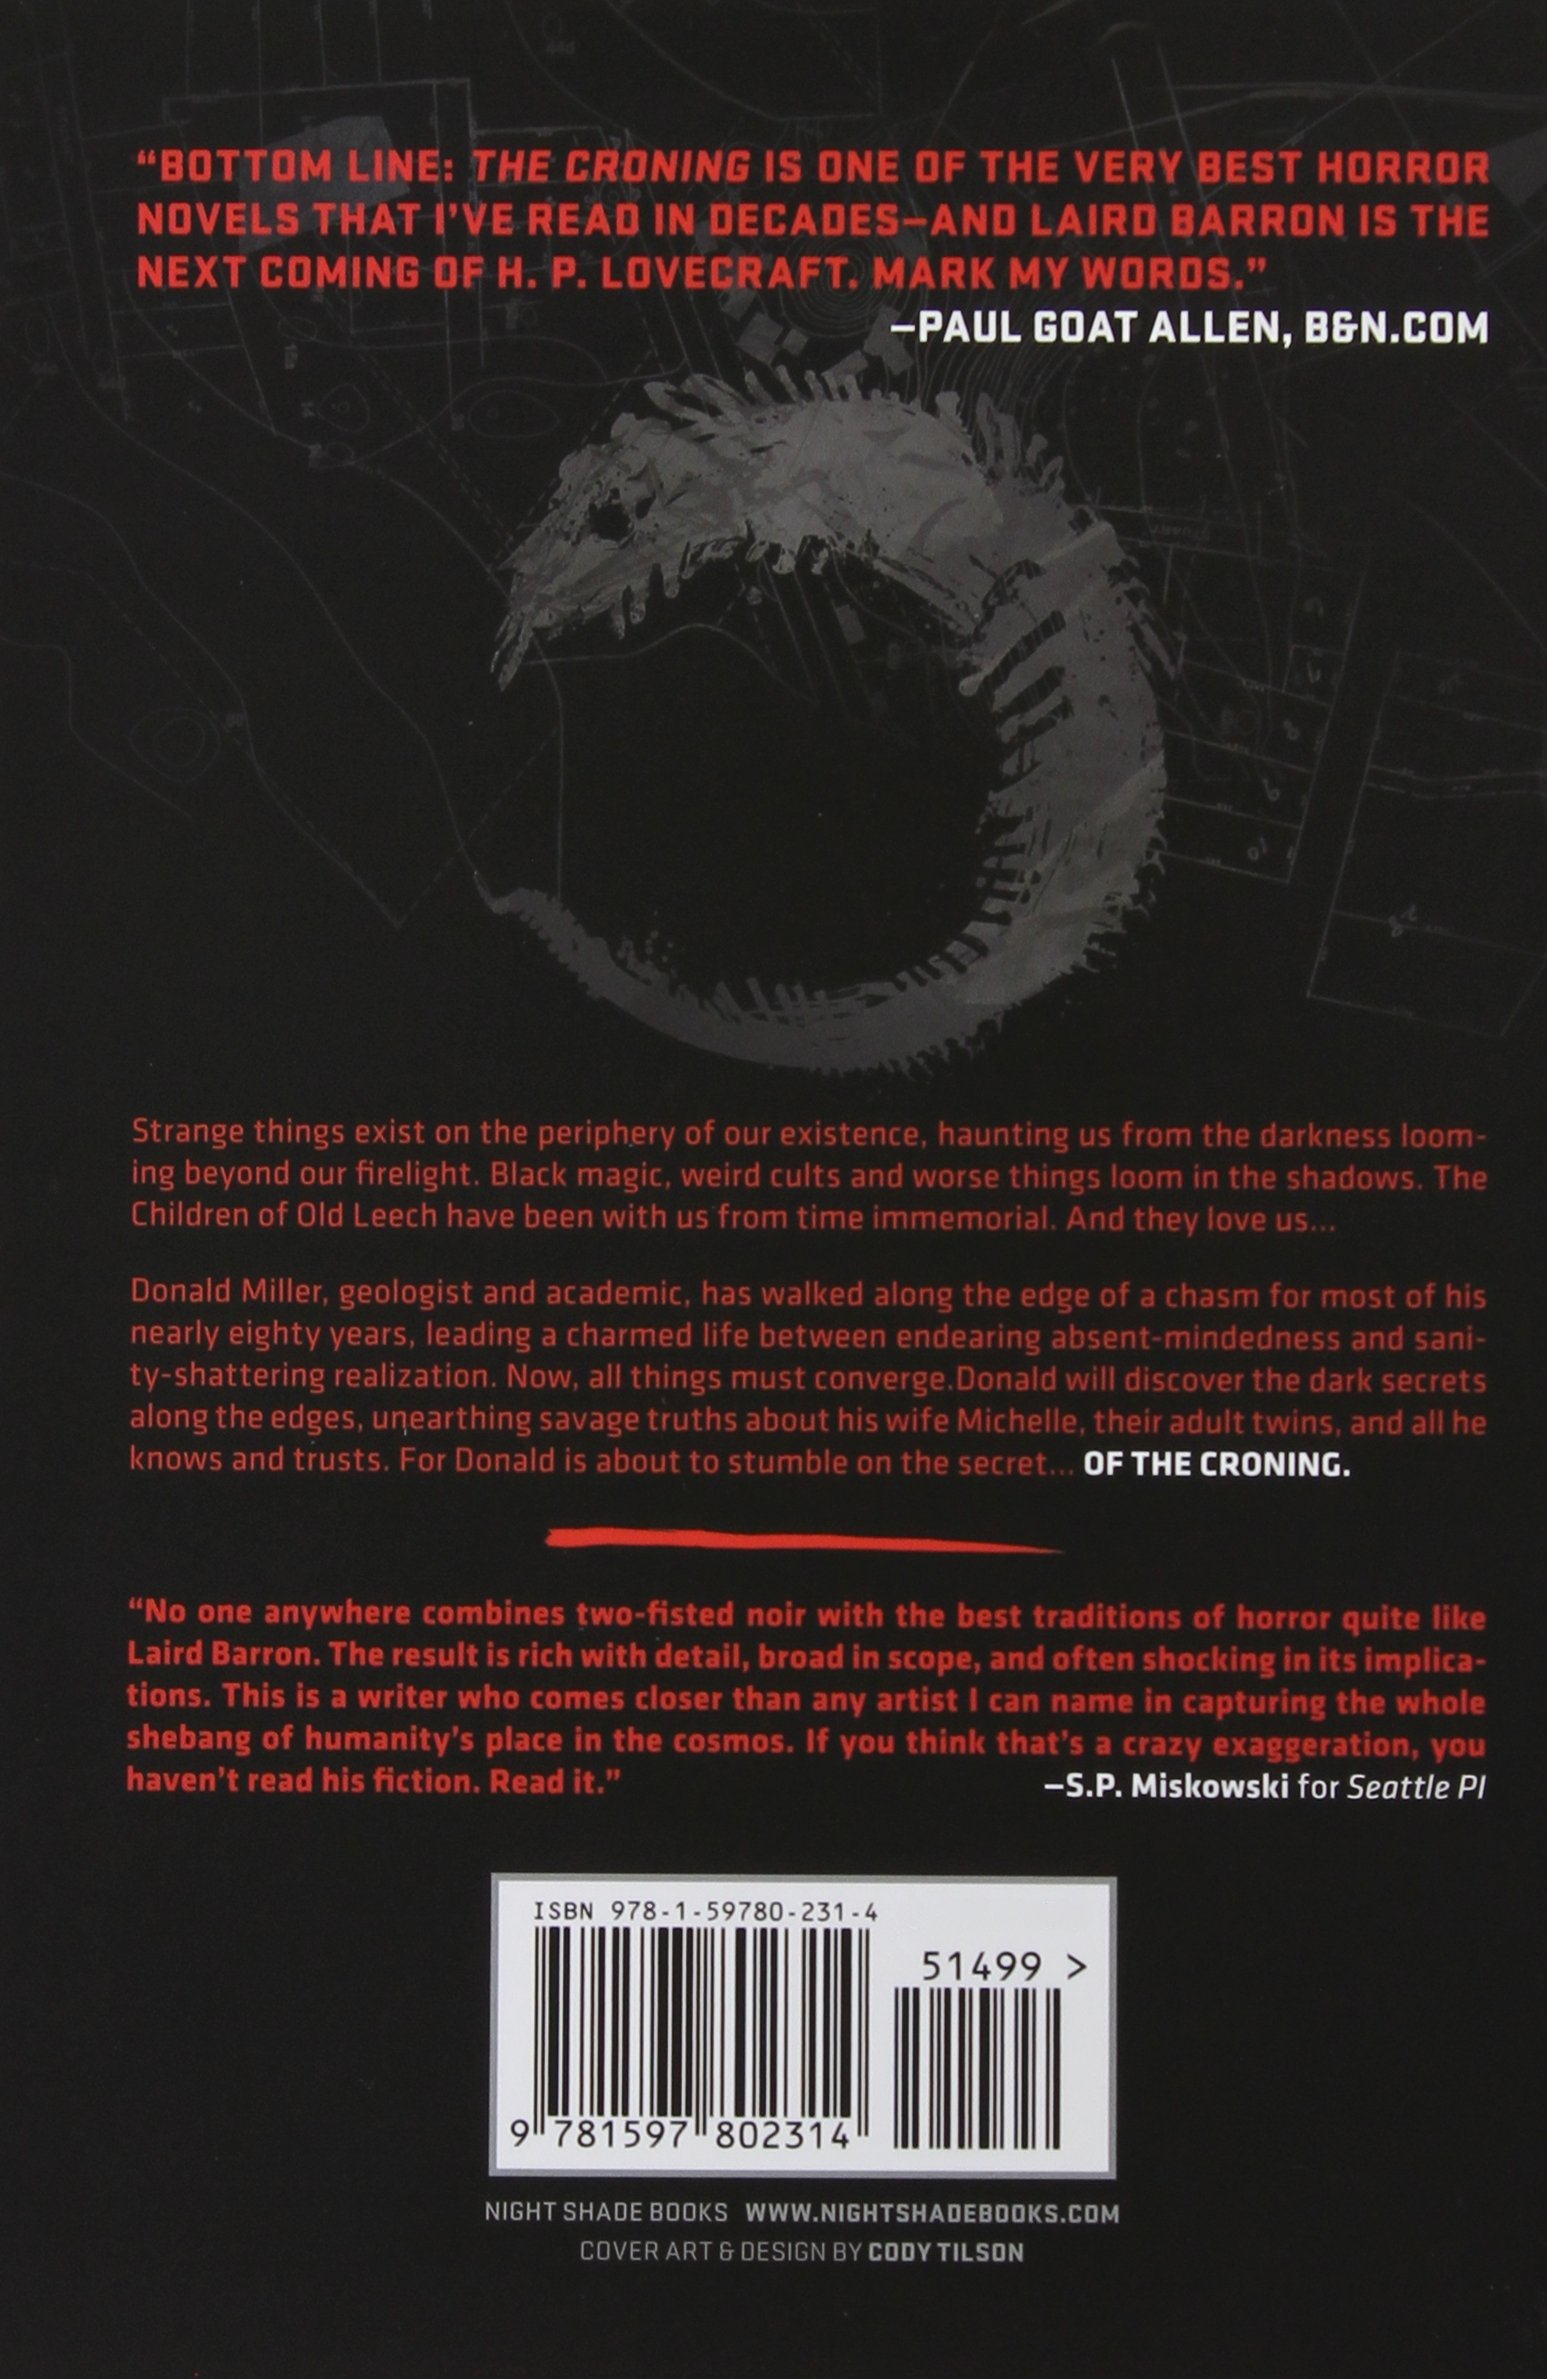 Amazon com: The Croning (9781597802314): Laird Barron: Books